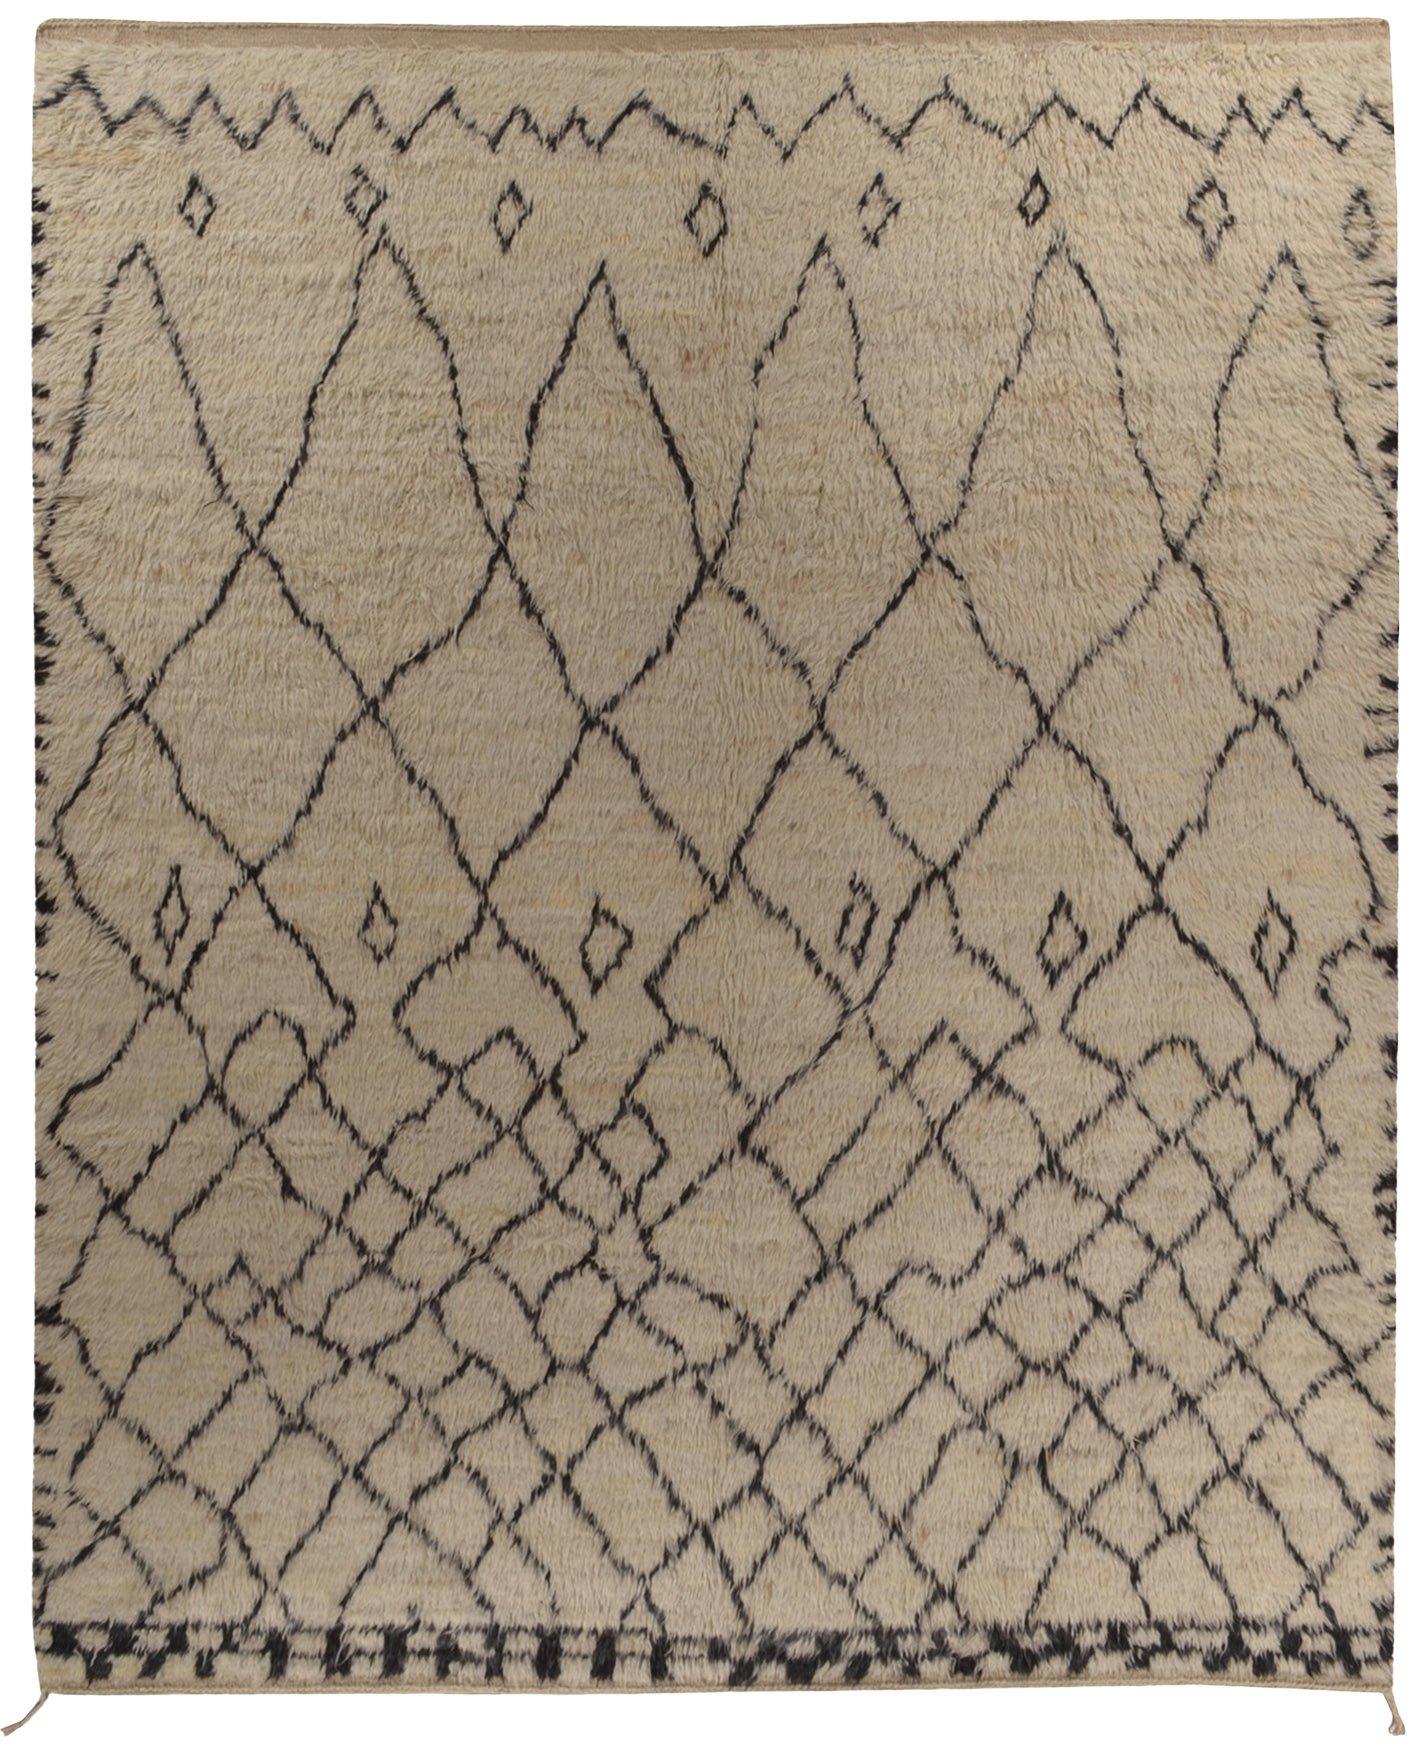 LaDatina_berber_carpets